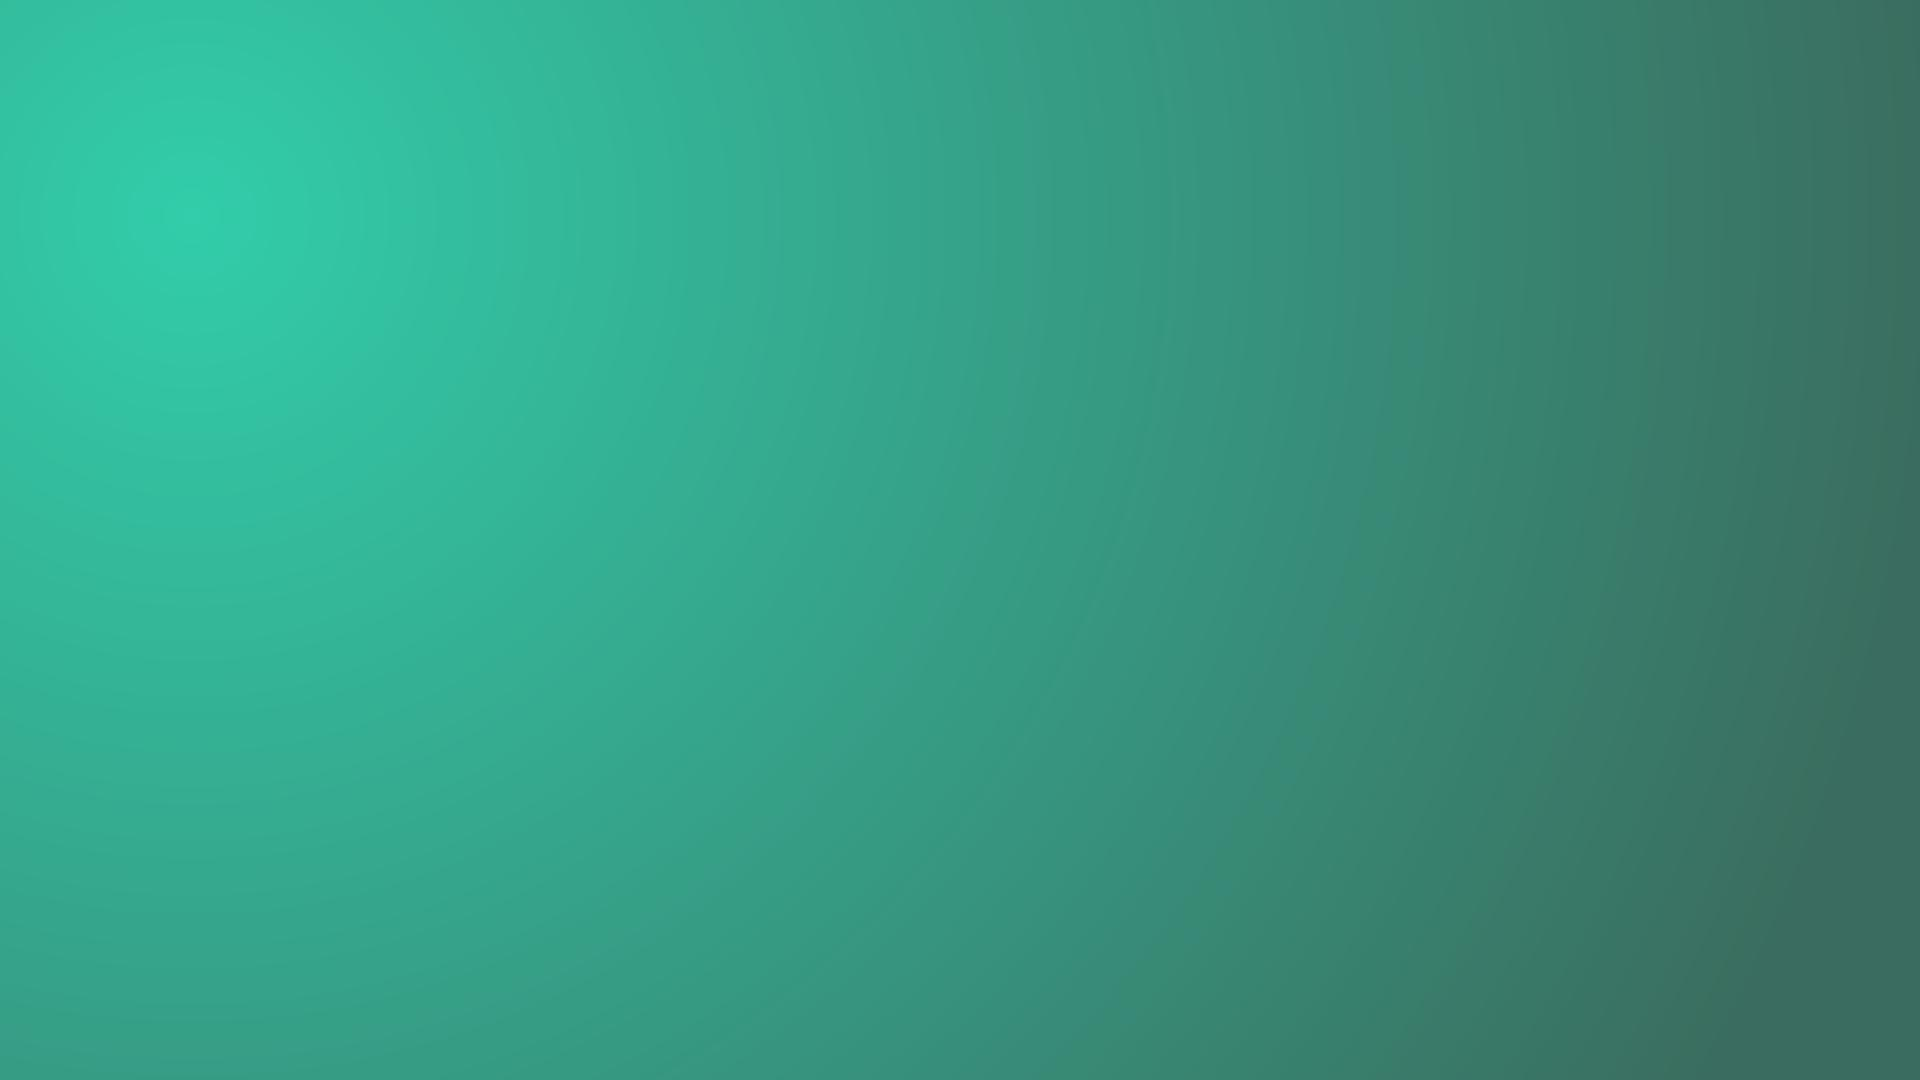 Muted Green/Aqua Gradient